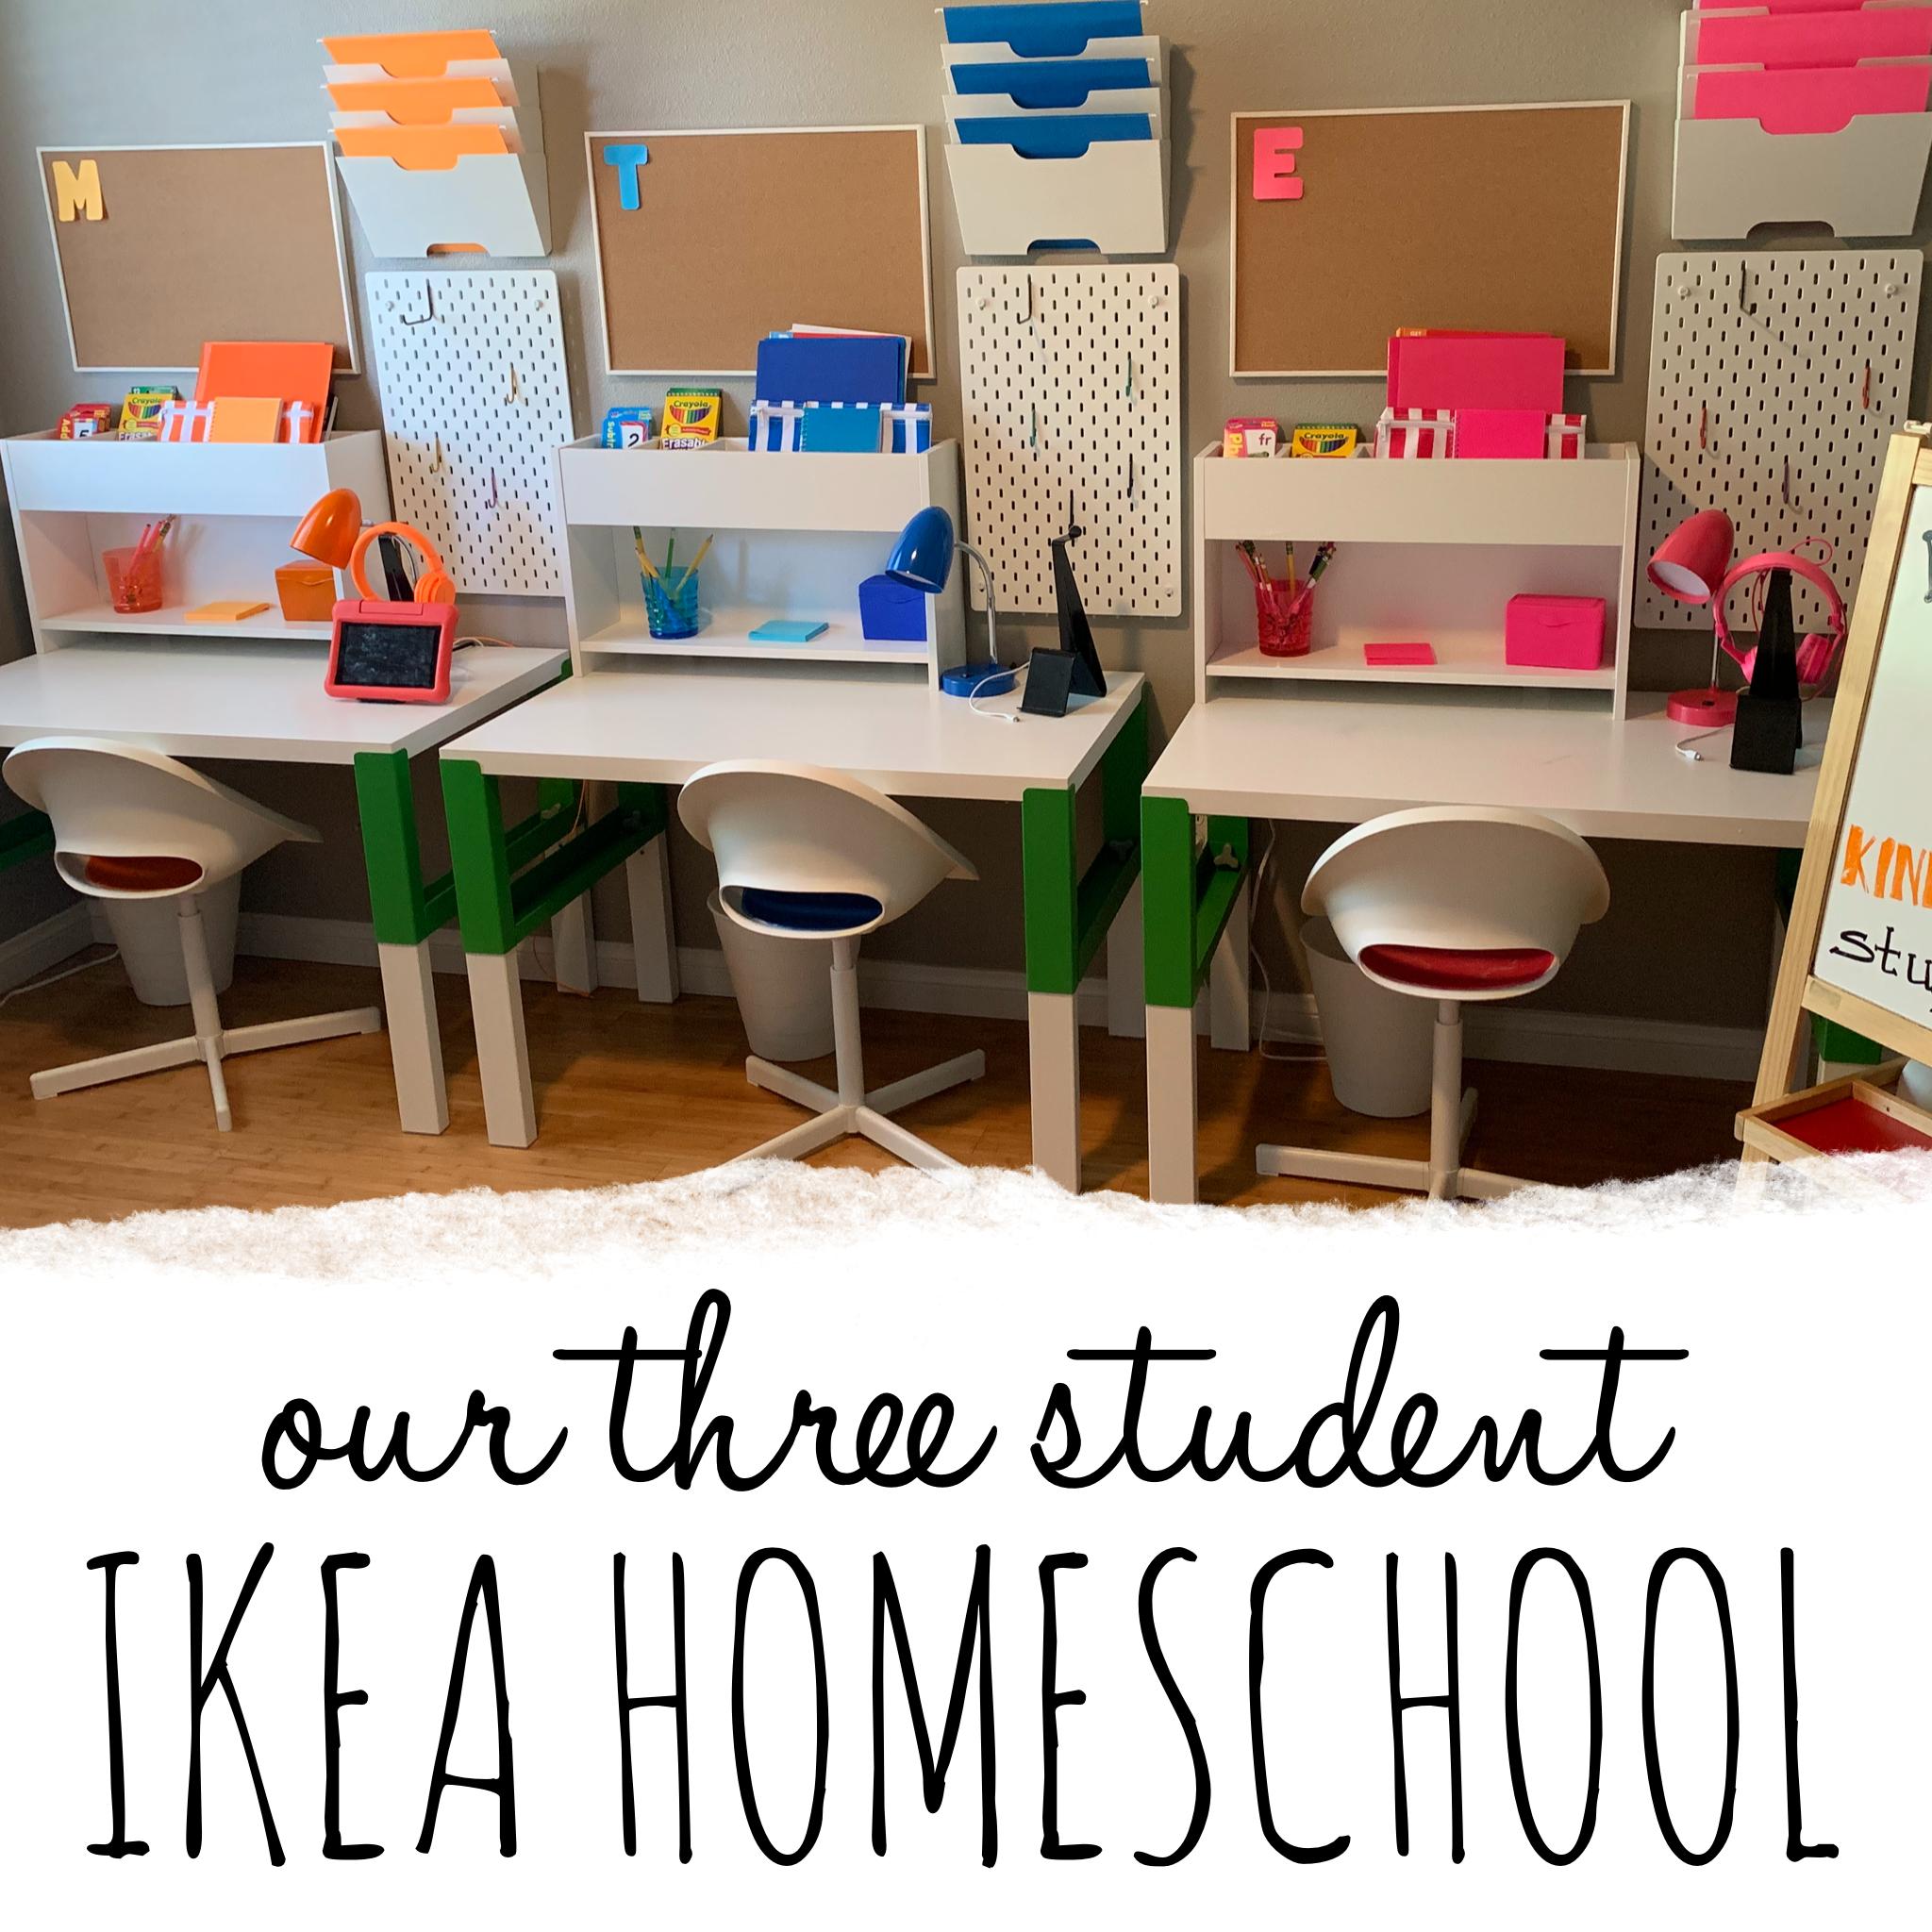 Ikea Homeschool Classroom In 2020 Kids Homework Room Homeschool Room Design Kids Homework Station